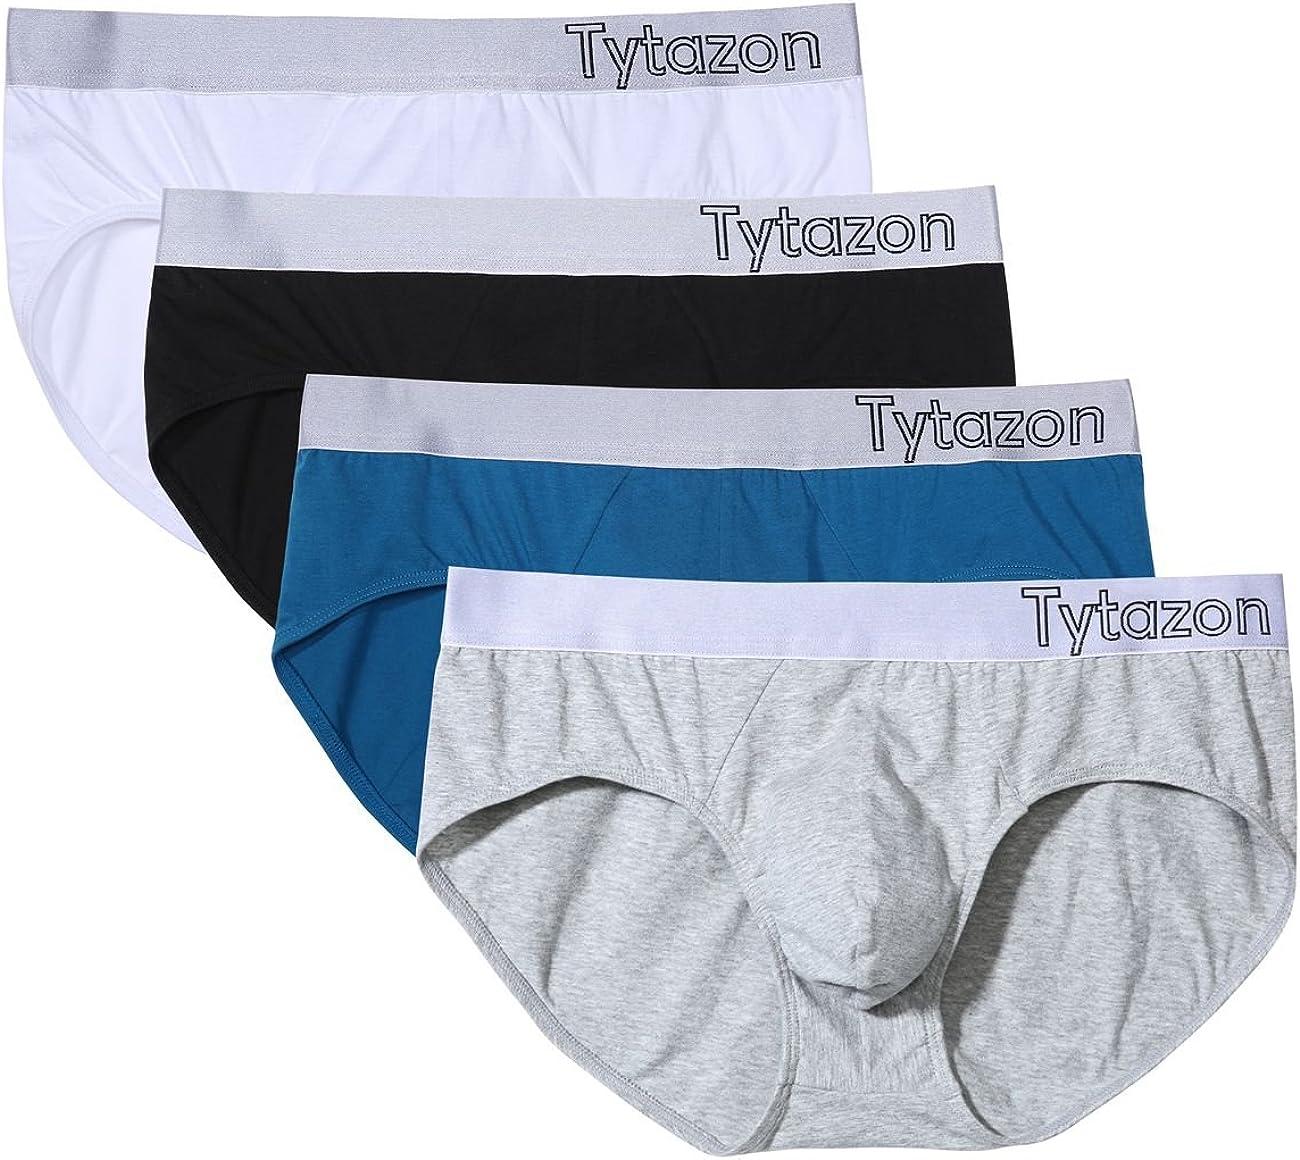 Tytazon Mens 4 Pack Cotton Hip Briefs Suport Hip